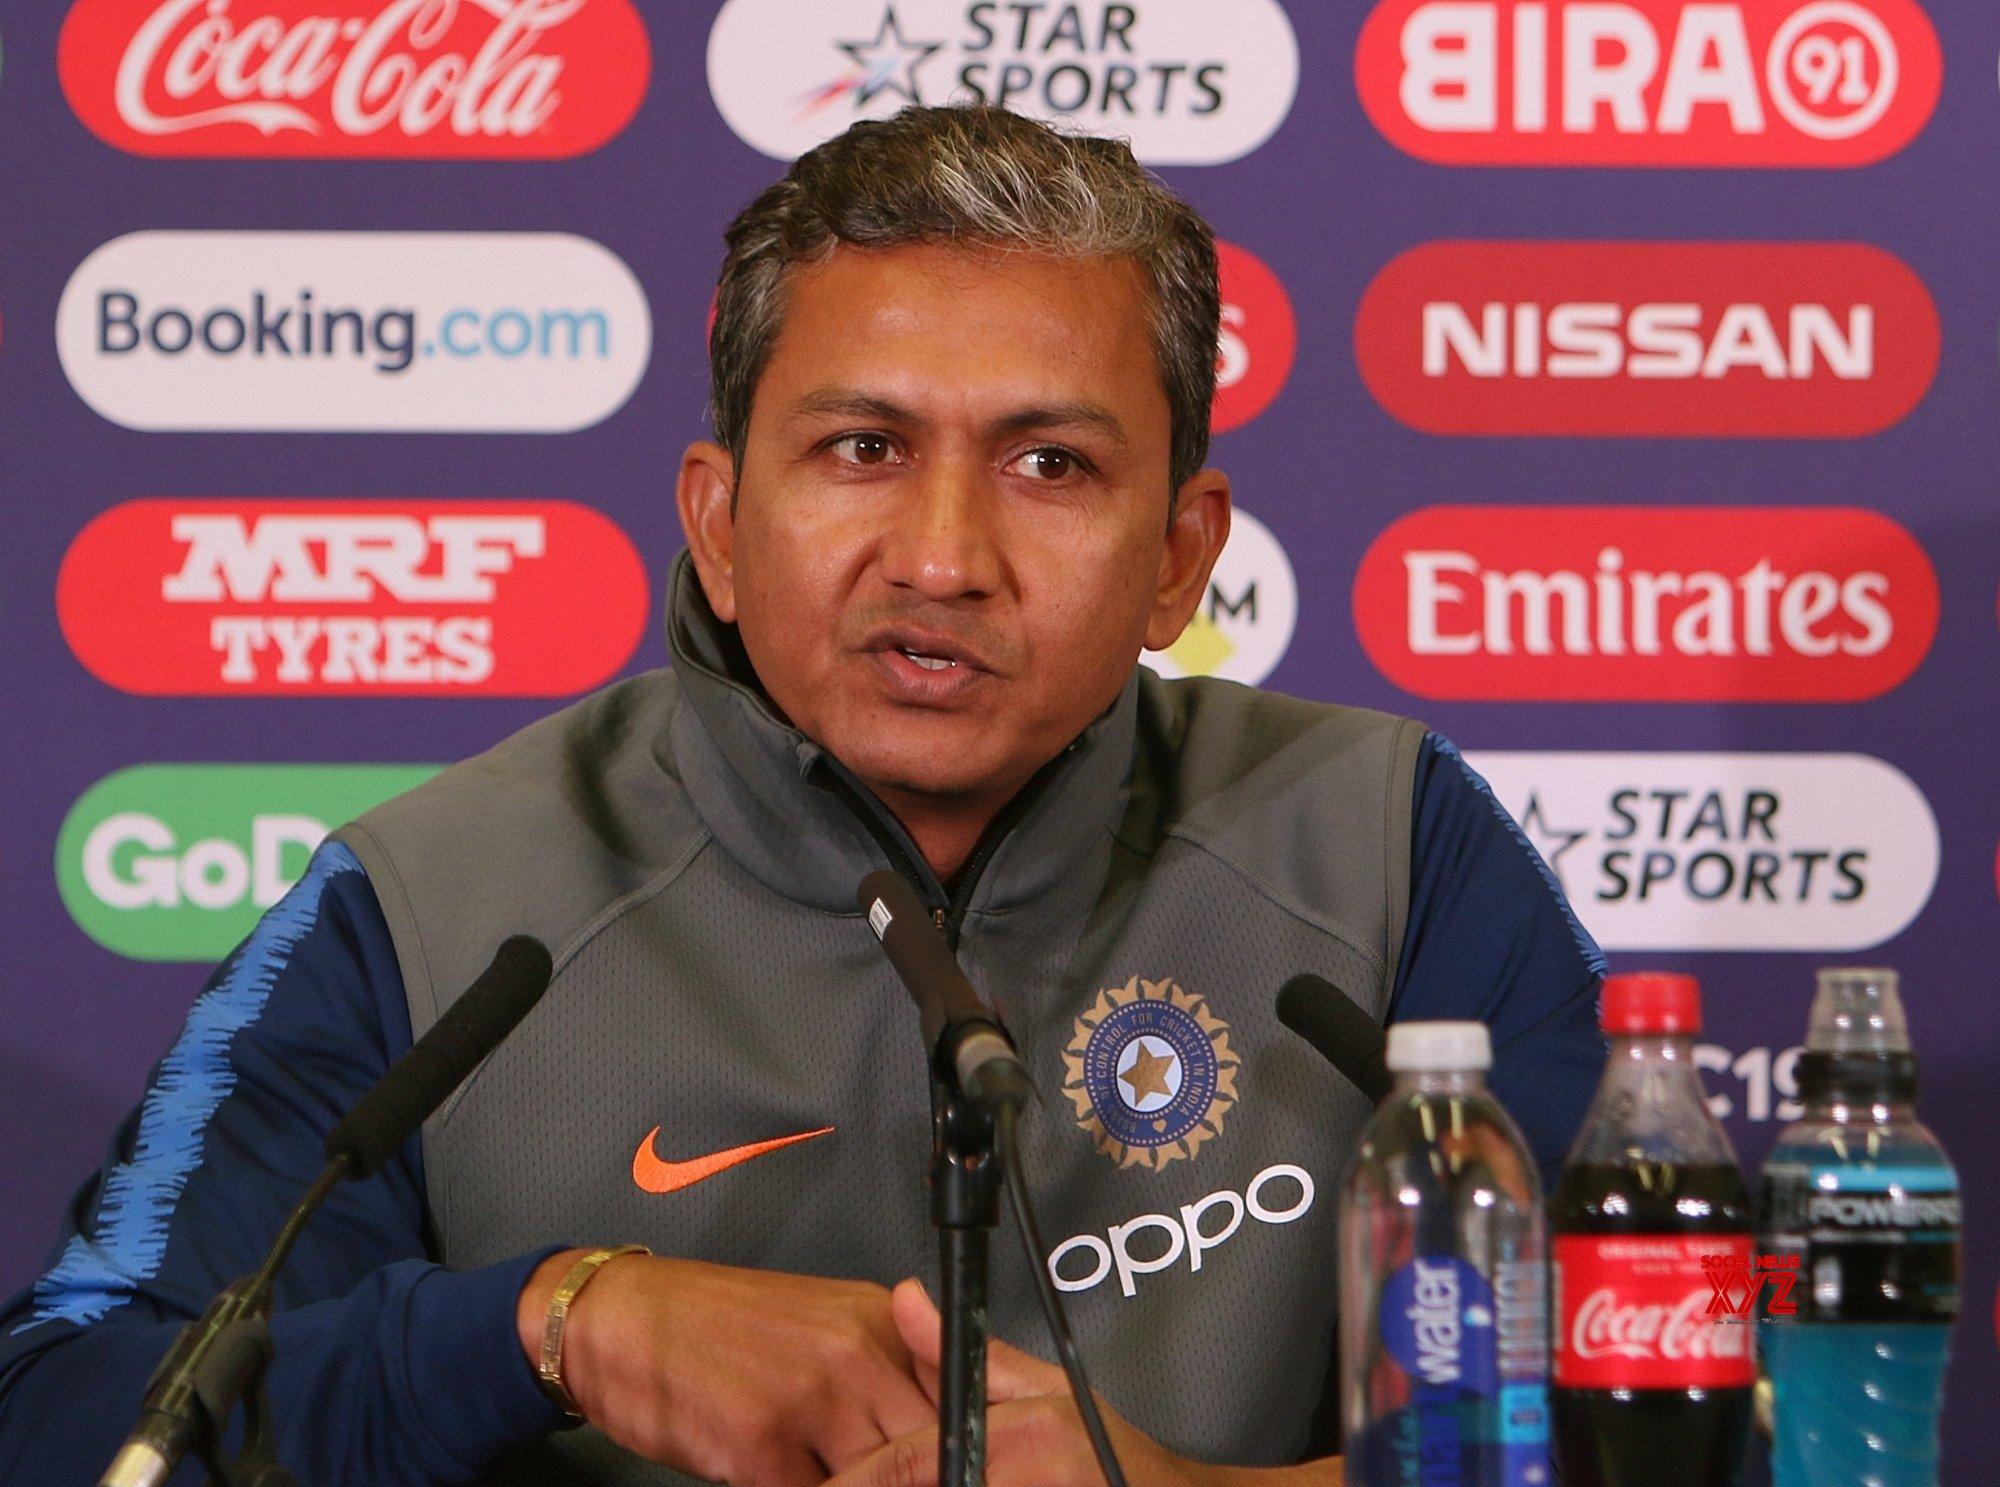 England: Sanjay Bangar's press conference #Gallery